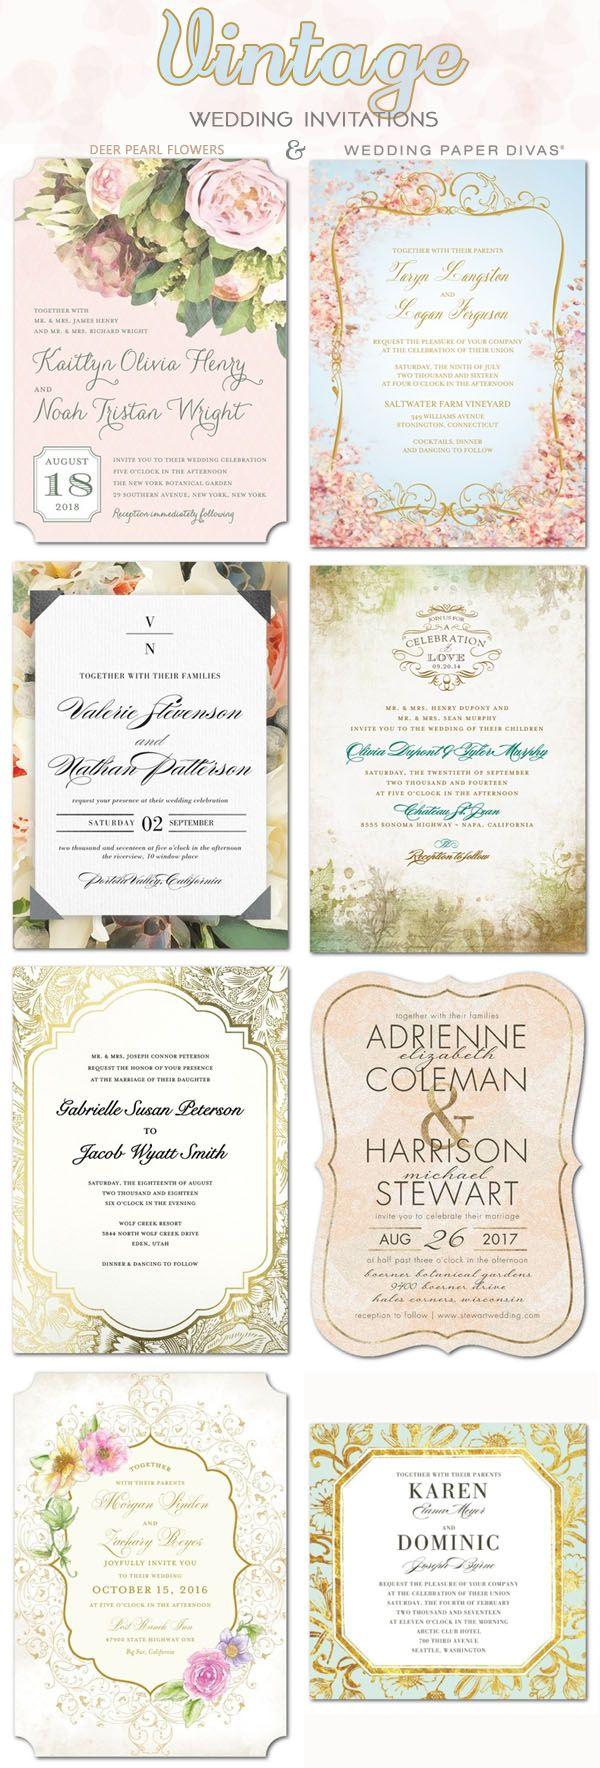 Vintage wedding ideas - vintage wedding invittaions / http://www.deerpearlflowers.com/wedding-paper-divas-wedding-invitations/